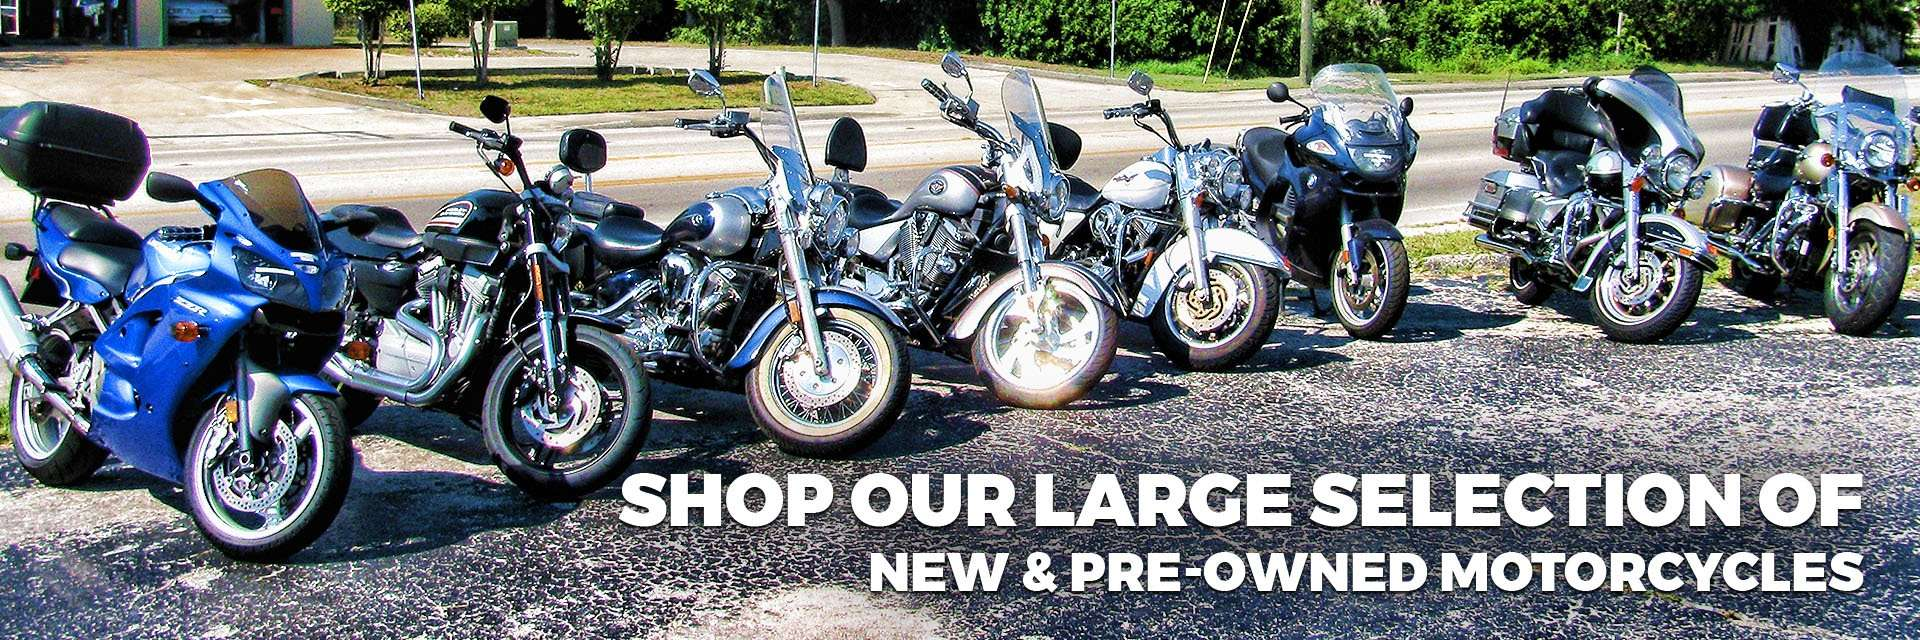 Hap's Cycle Sales | Motorsports Vehicles & BMX Bikes for ...